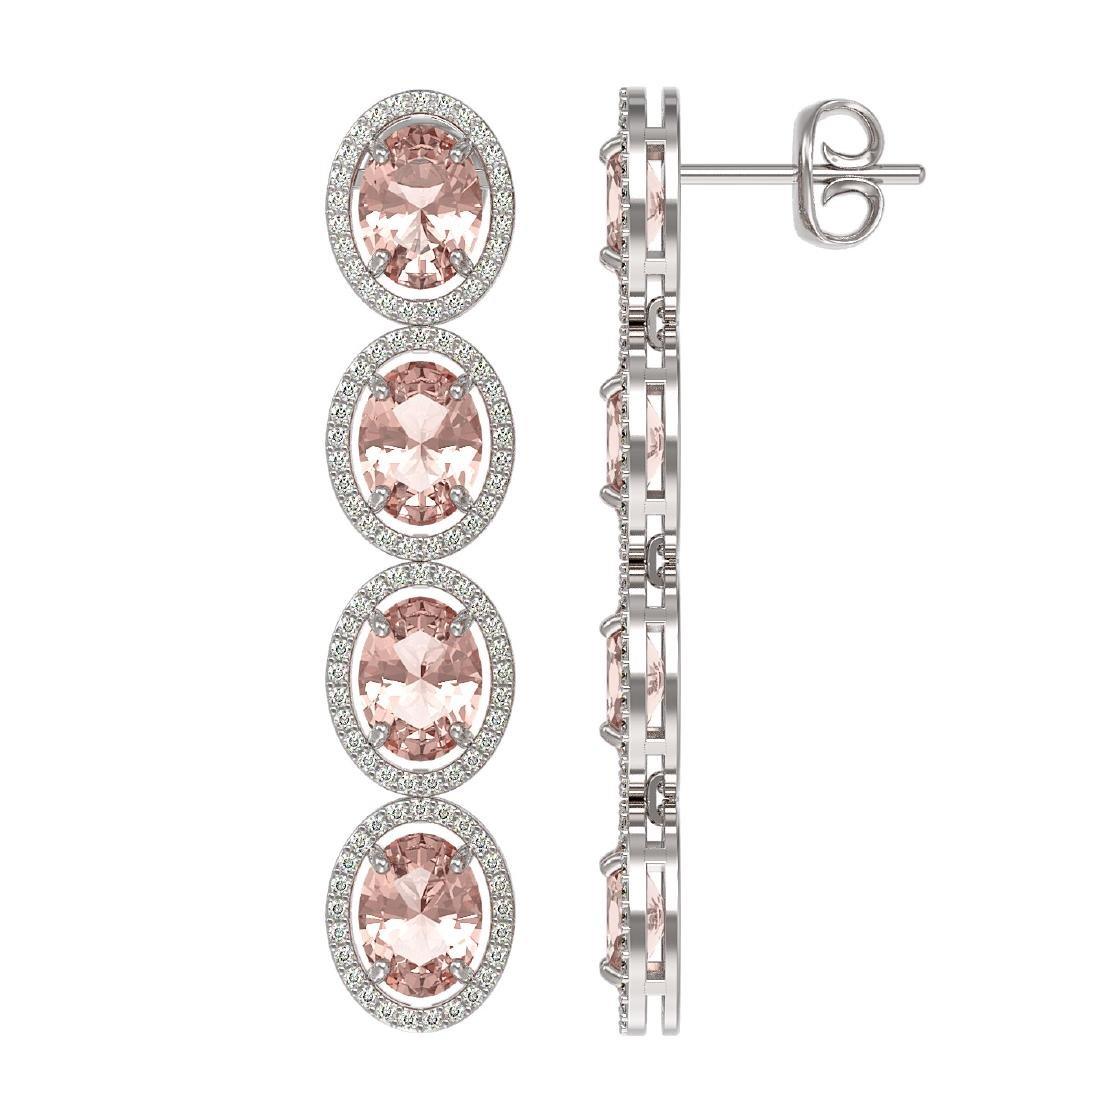 11.4 CTW Morganite & Diamond Halo Earrings 10K White - 2